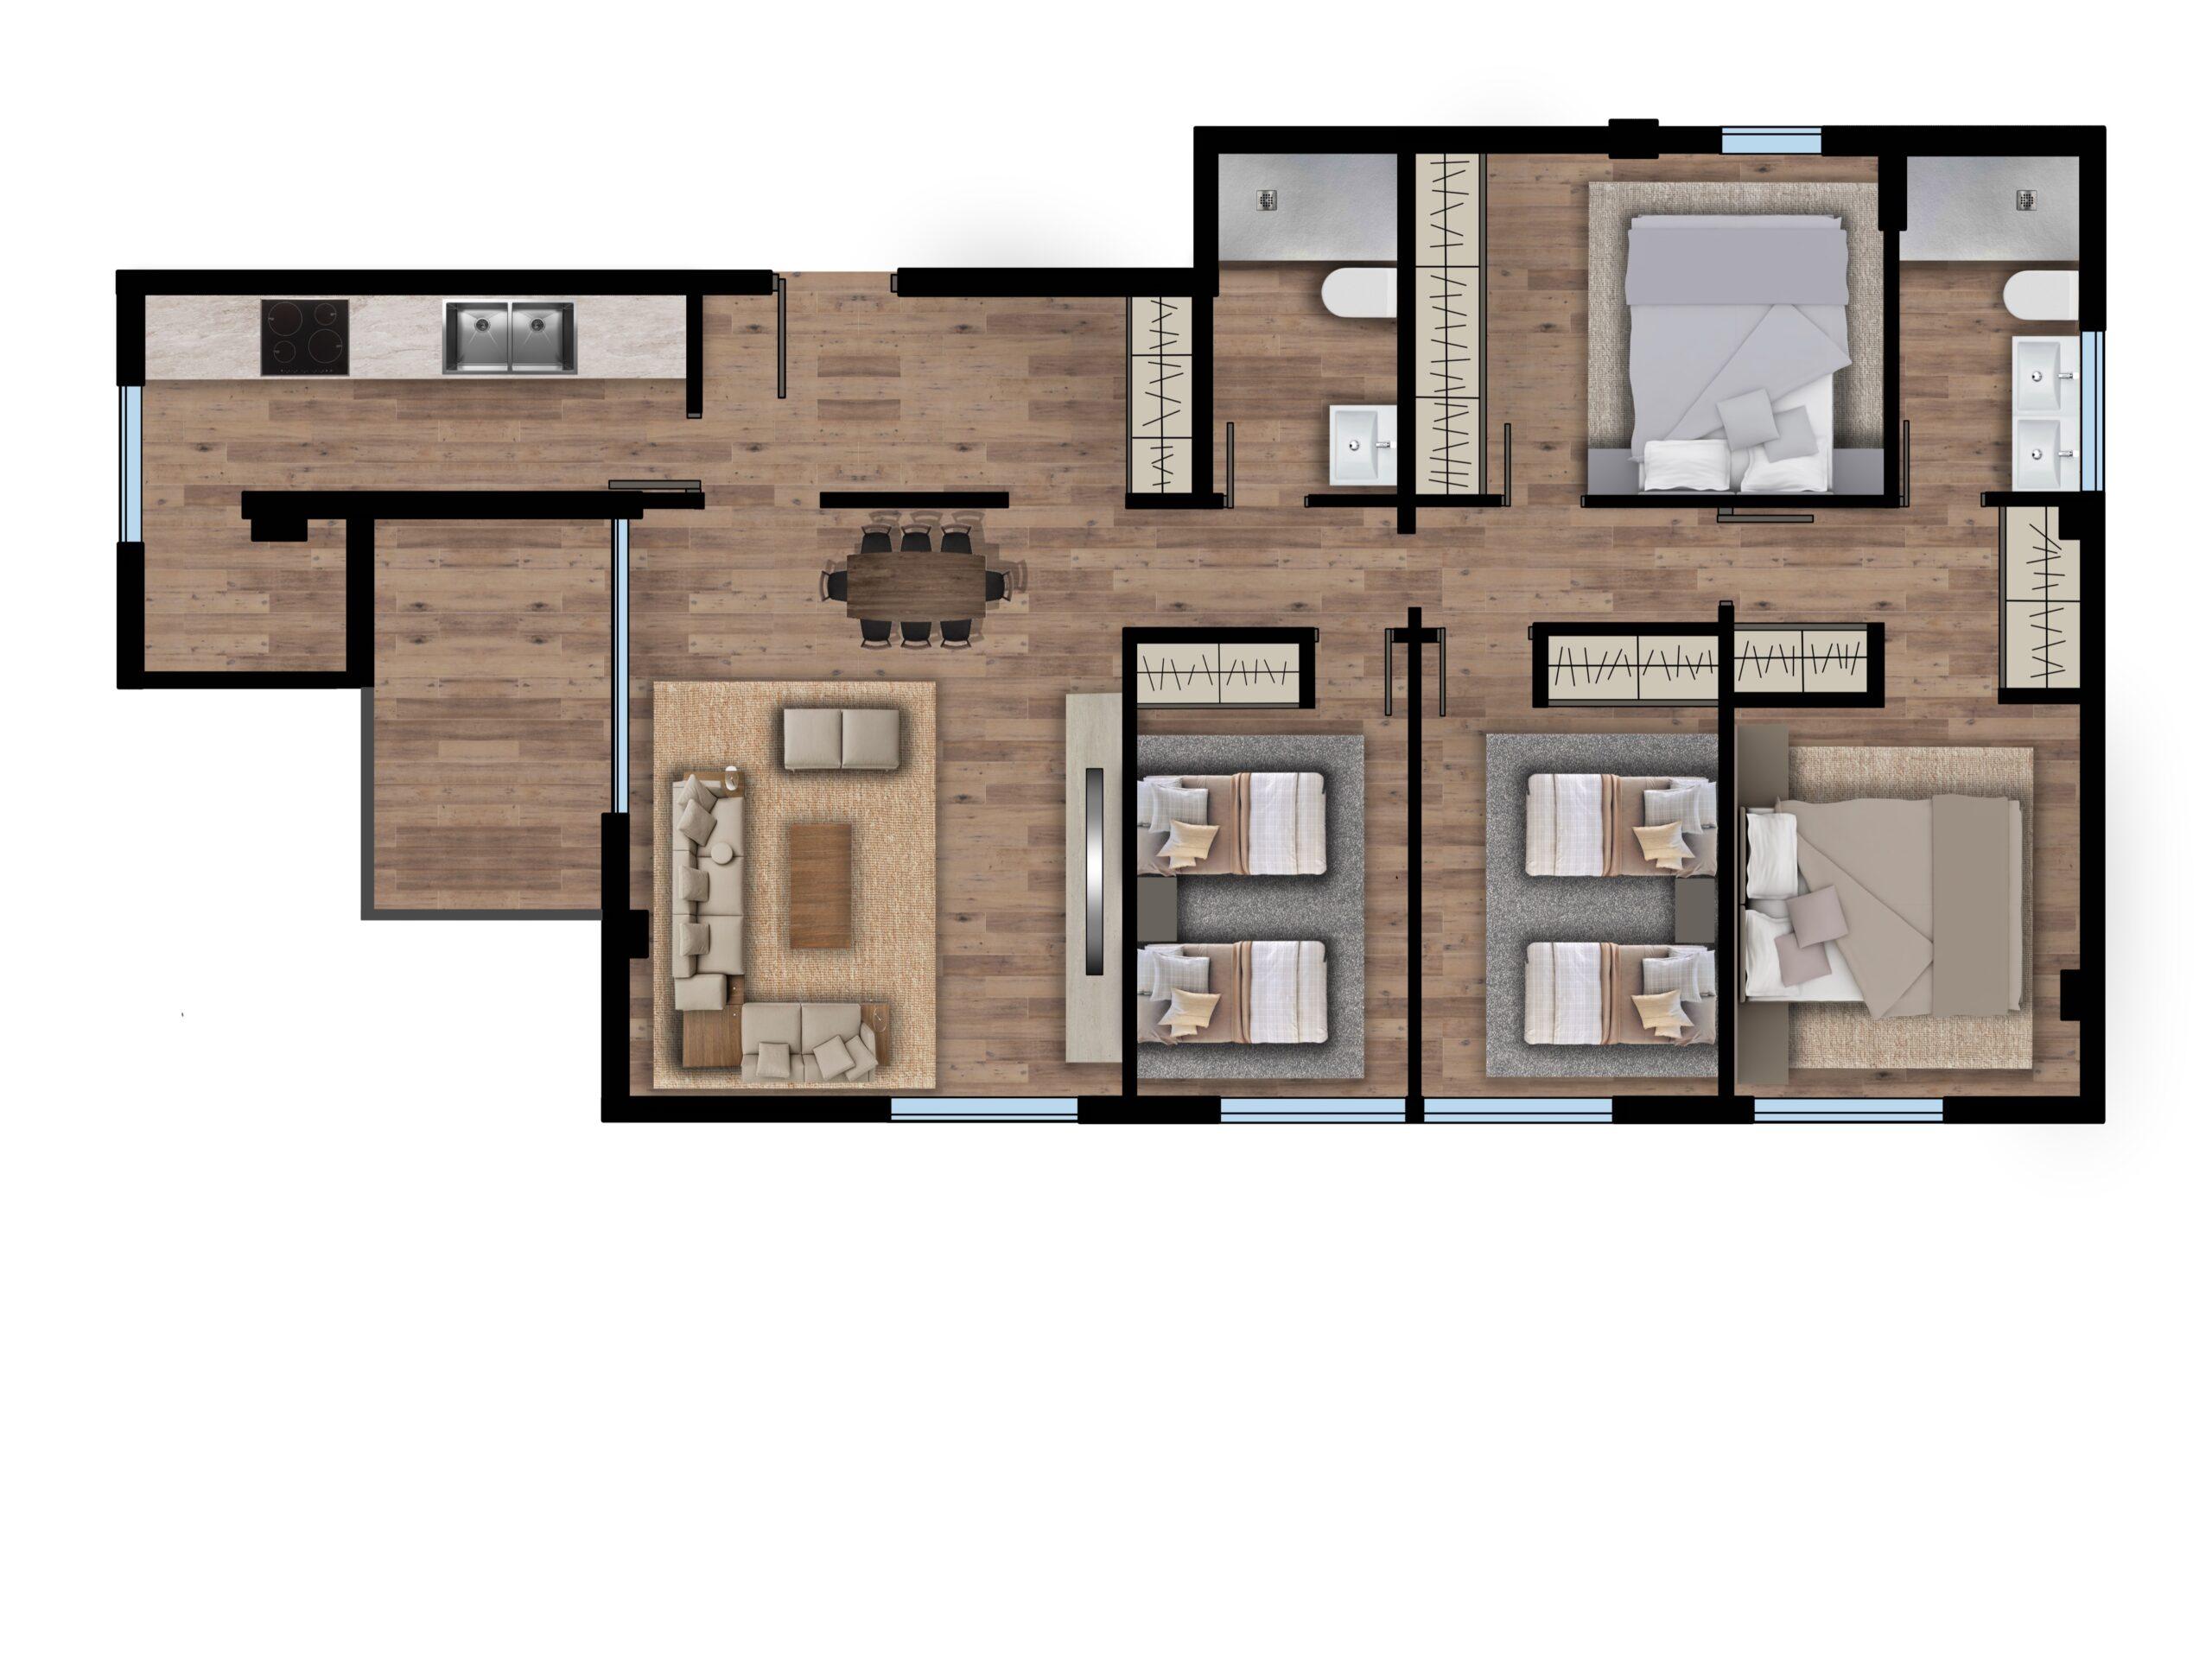 Plano 4 dormitorios Bulevar ok